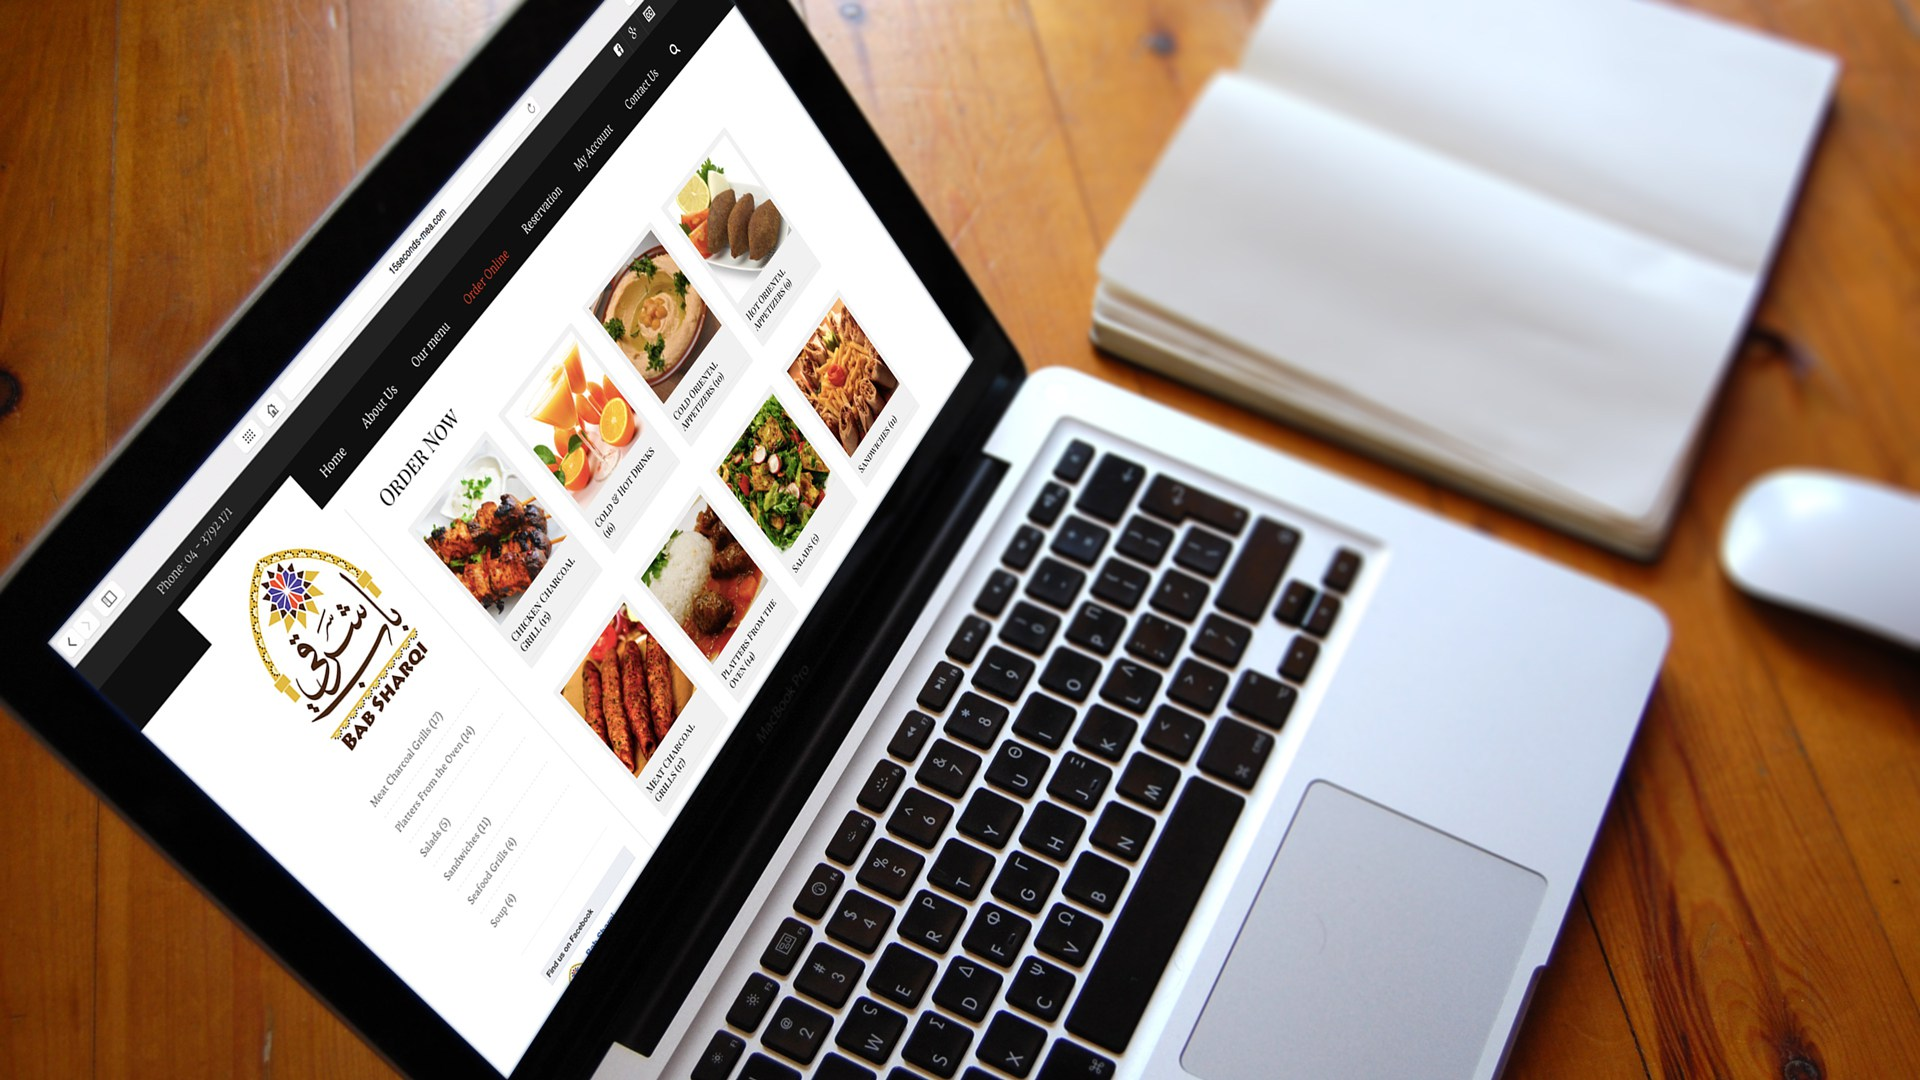 bab-sharqi-website-mac-book